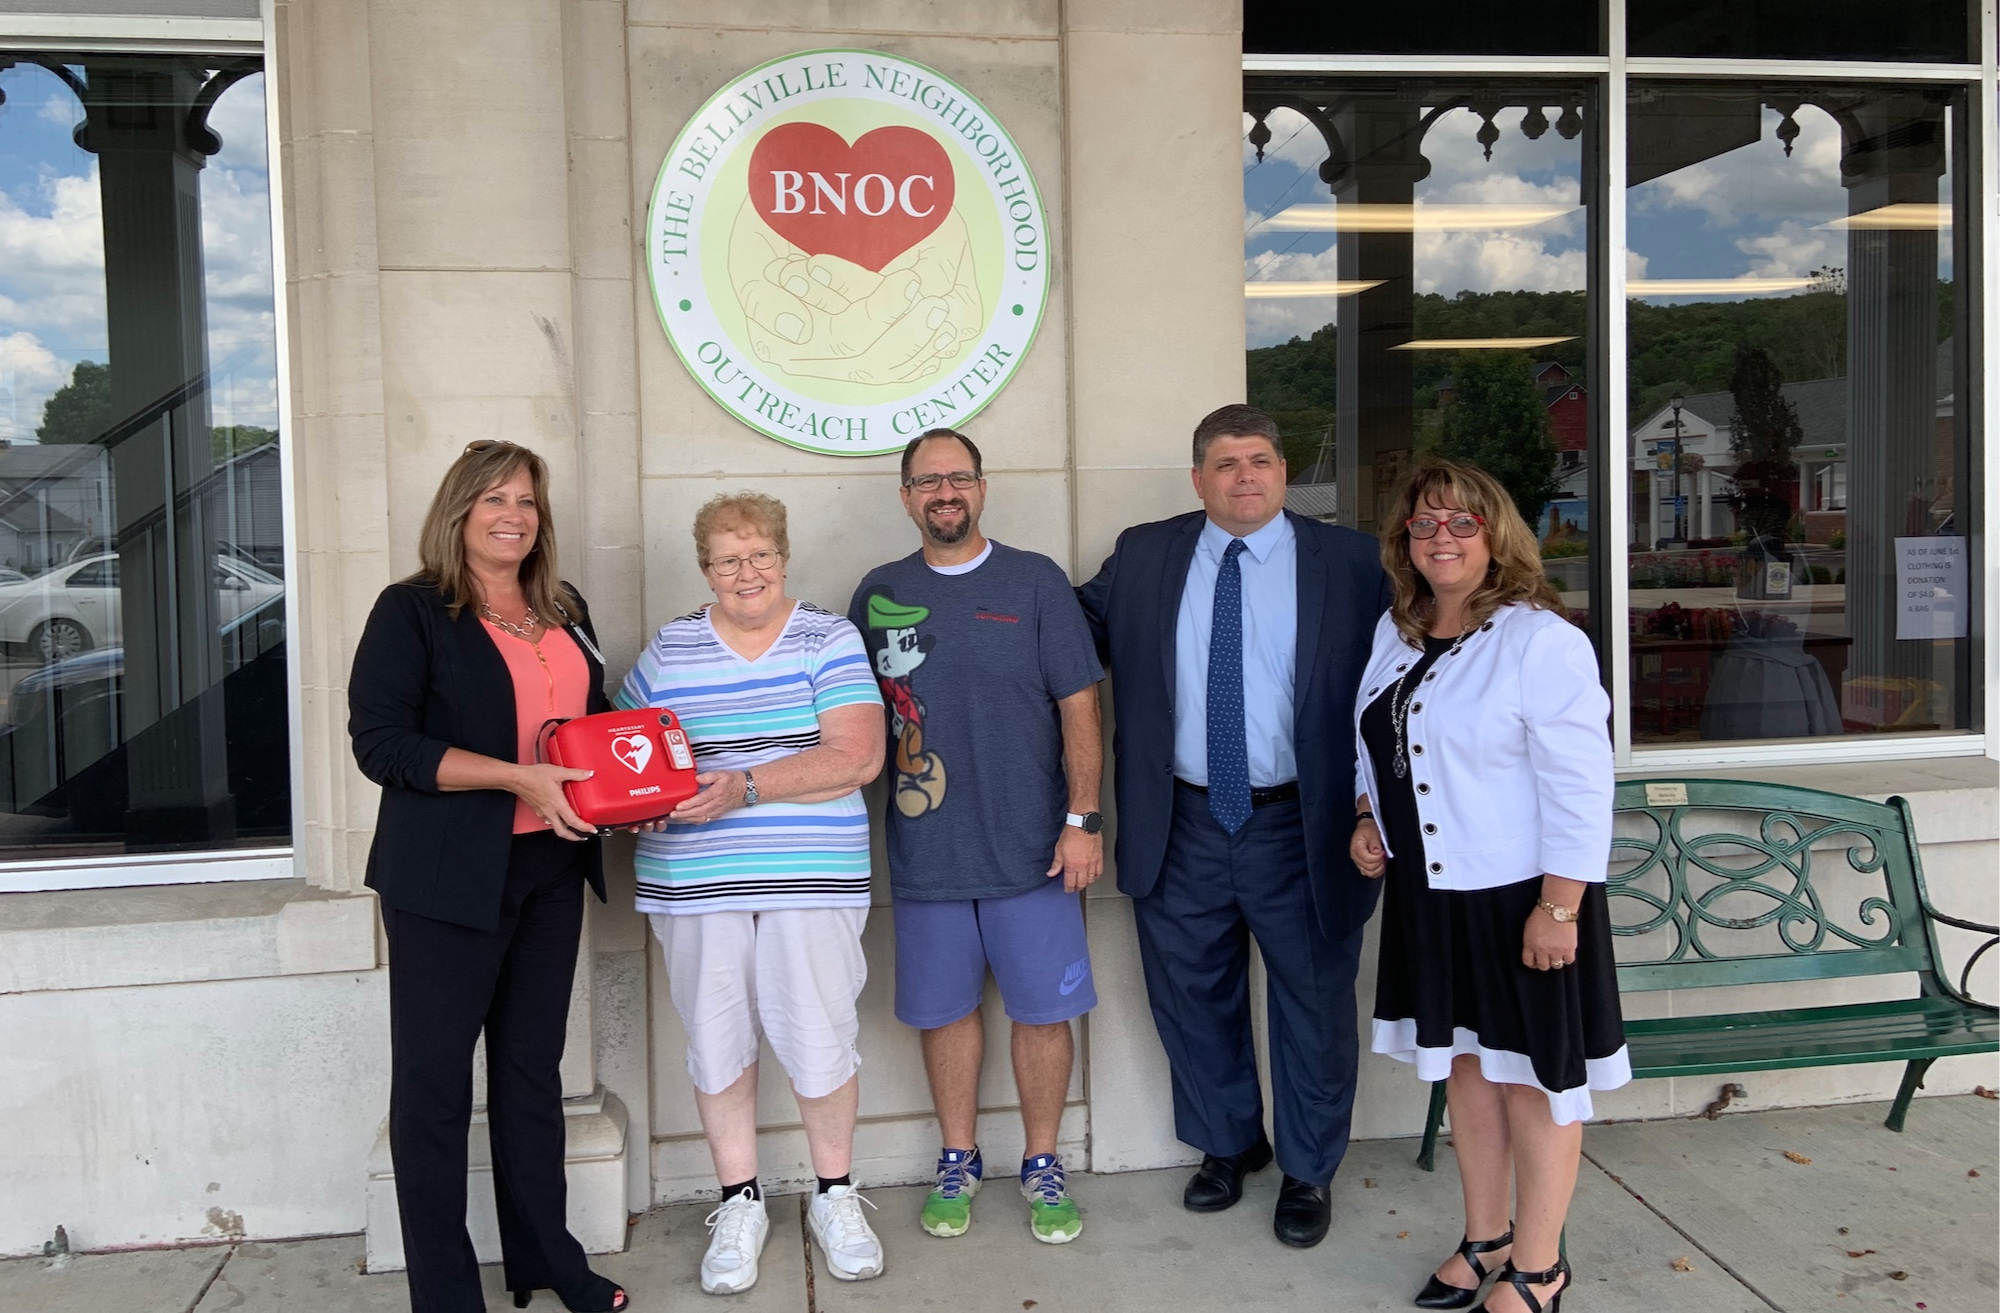 Pictured (left to right): Kim Winkle (Avita Hospital), Carol Hoeflich (BNOC Food Pantry Manager), Matt Merendino (BNOC President), Chuck Cangelosi (Avita Foundation Director), and Teri Brenkus (Bellville Mayor)